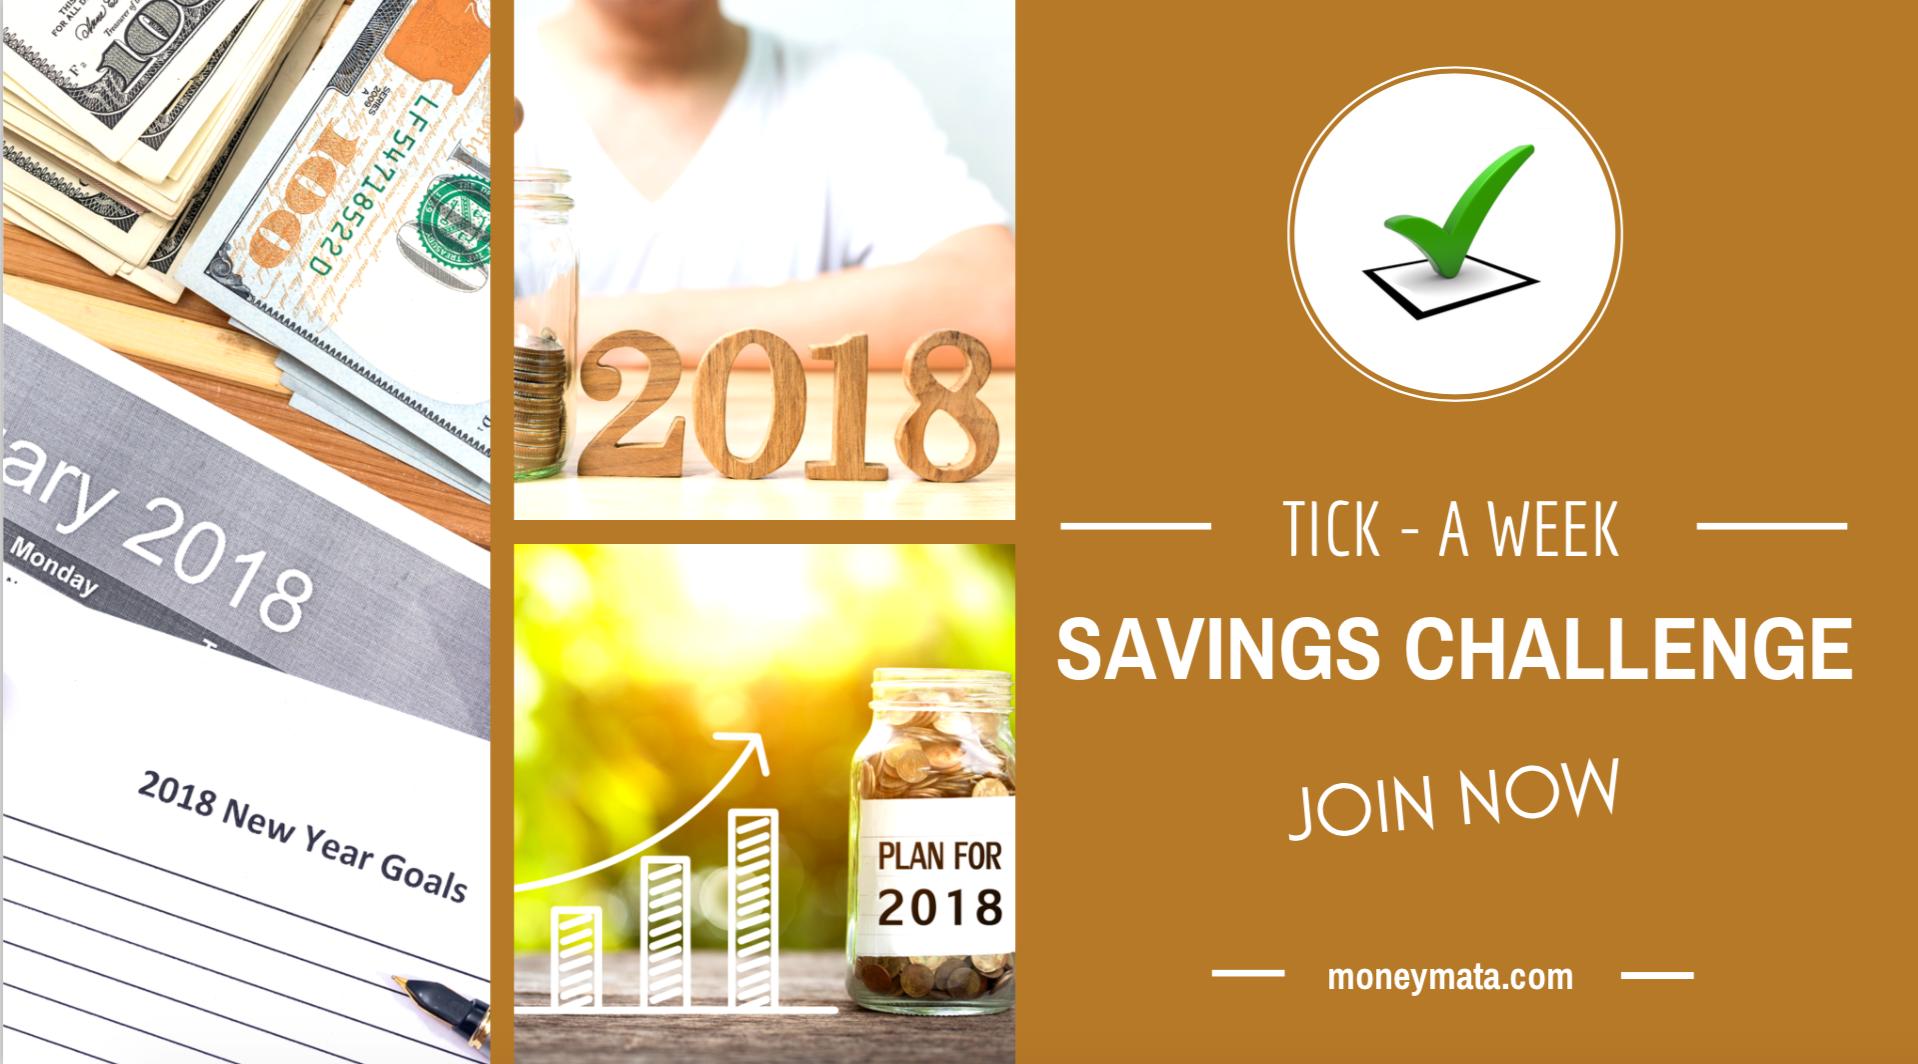 Join Tcik a Week Savings Challenge